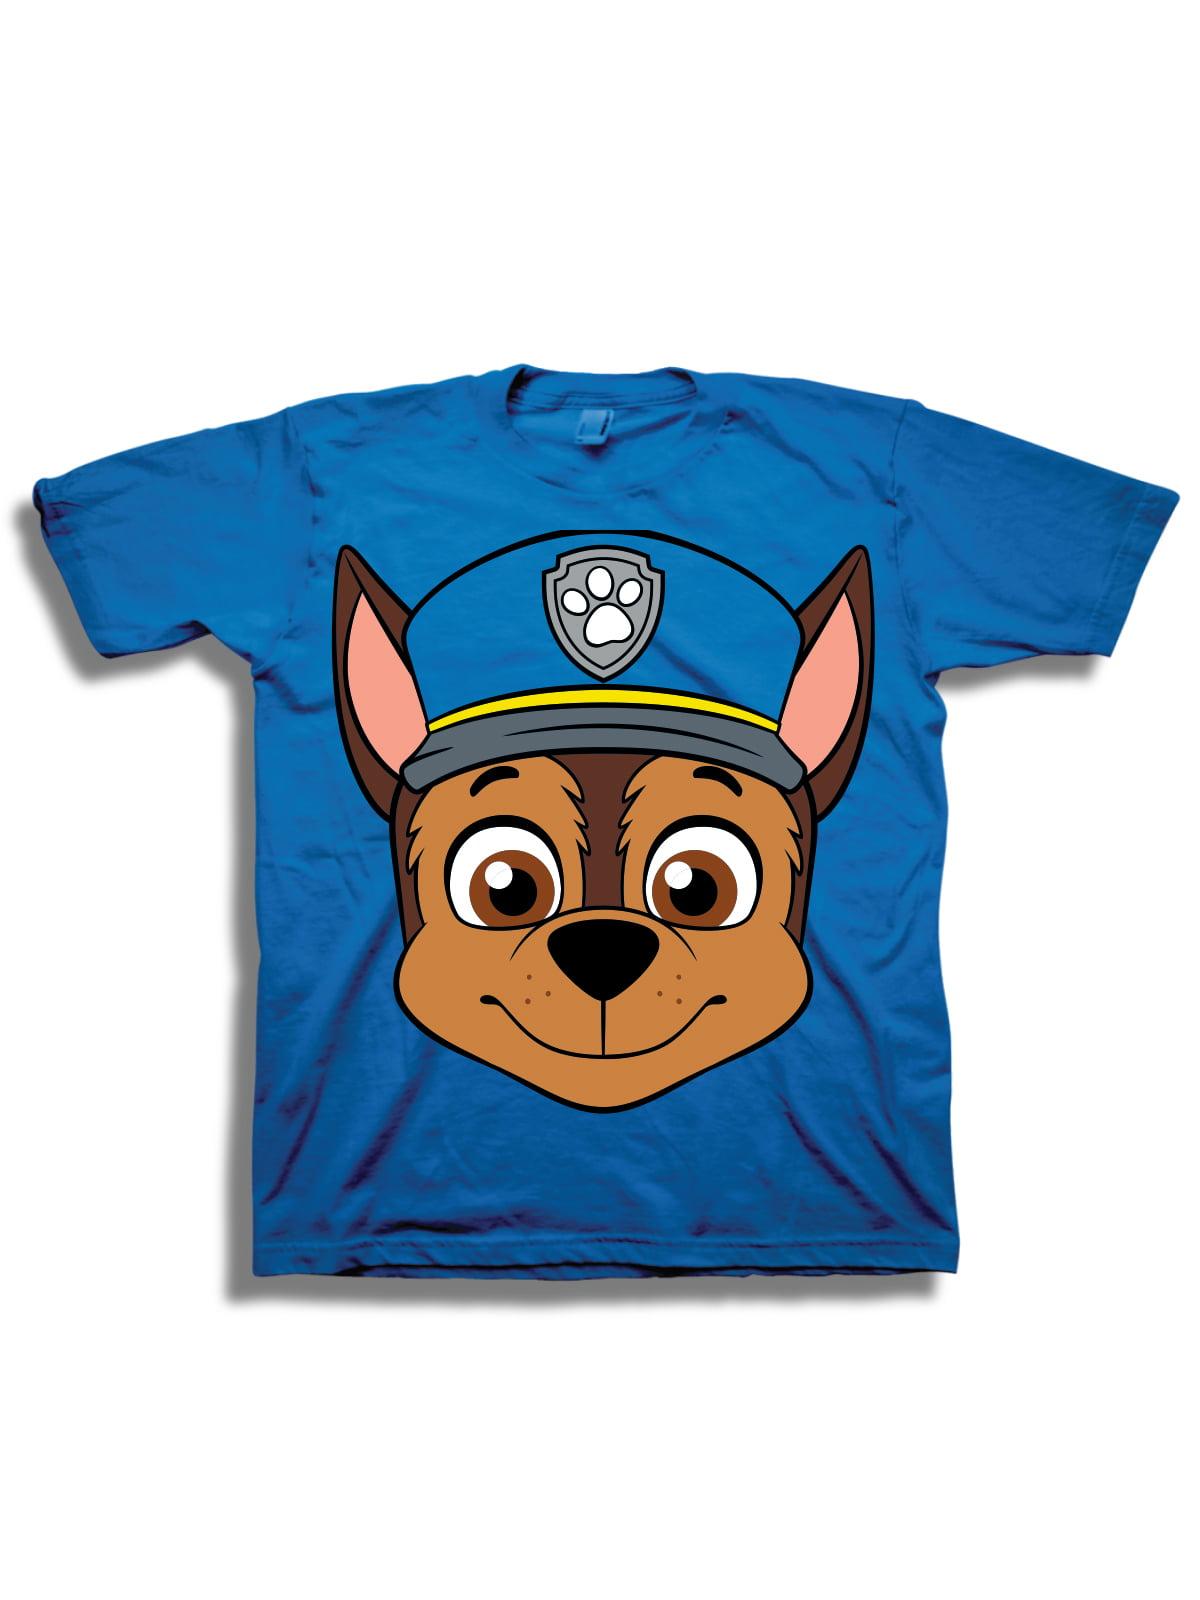 Paw Patrol Chase Short Sleeve Shirt (Toddler Boys )